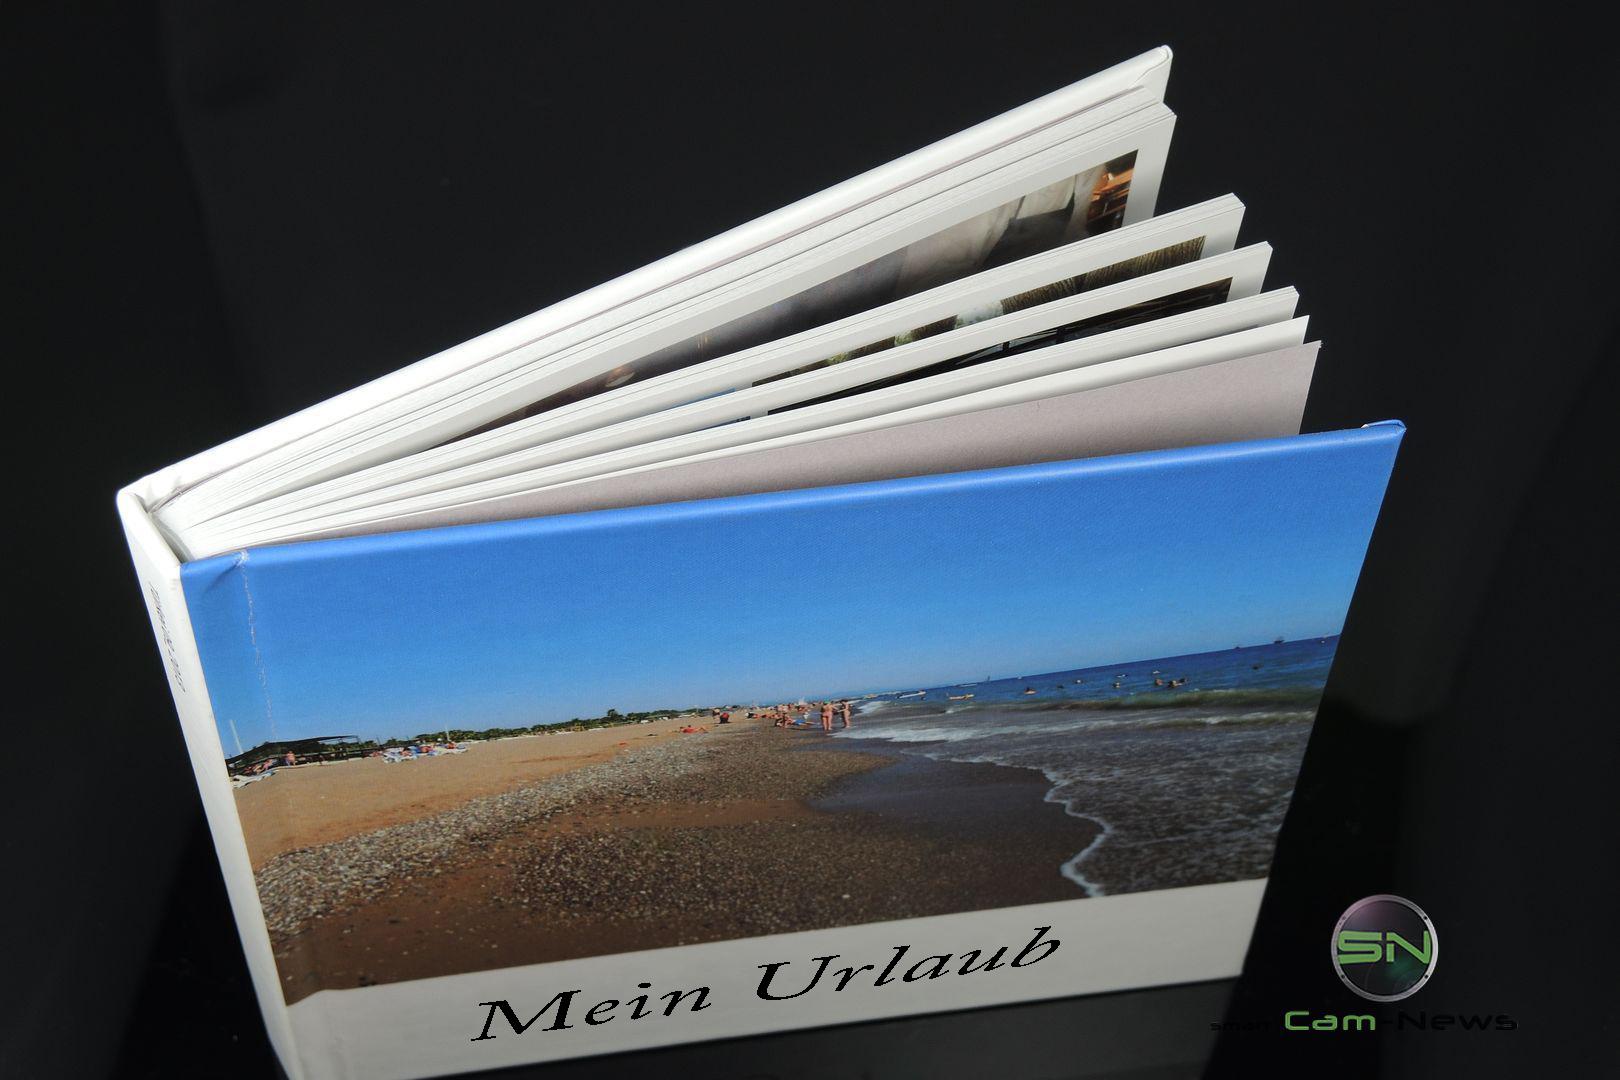 Fotobuch Story Album App – Firma Blurb Print